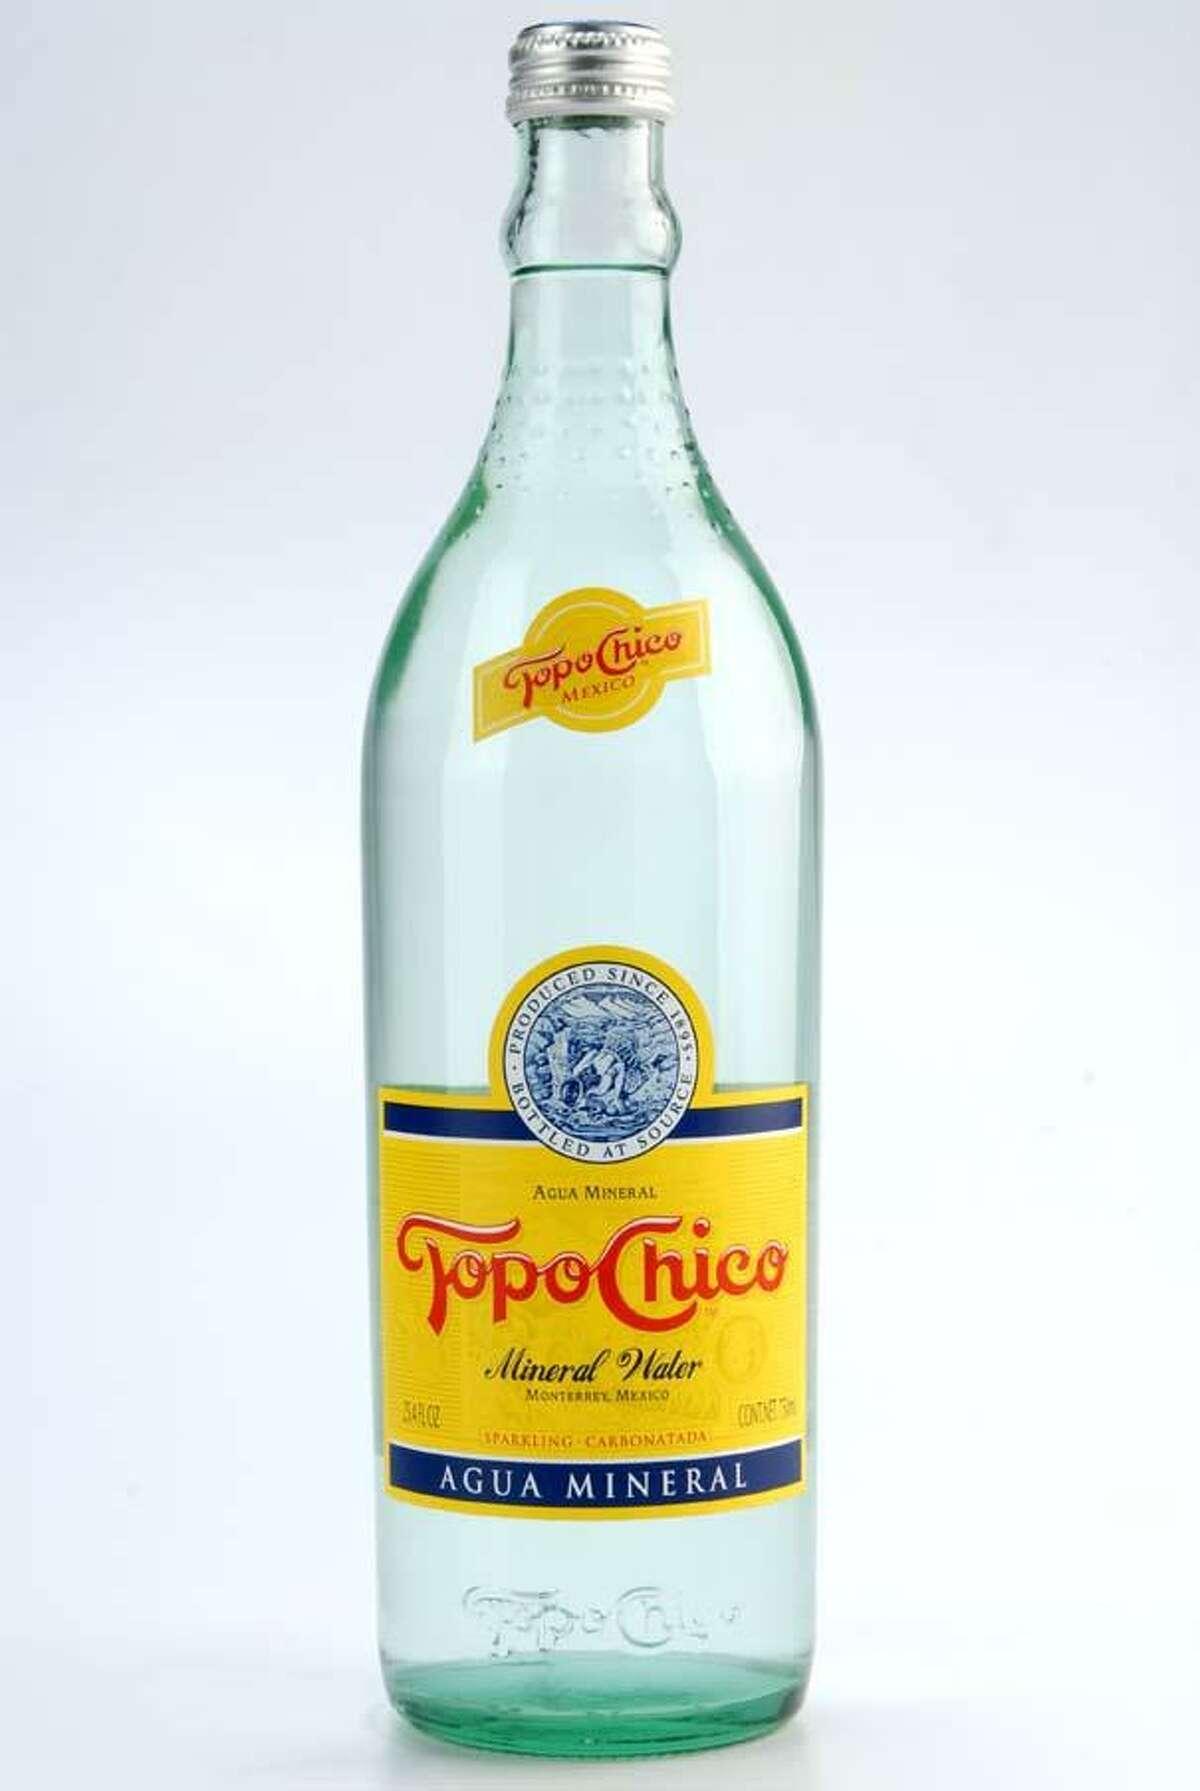 Topo Chico is bottled in Monterrey, Mexico.